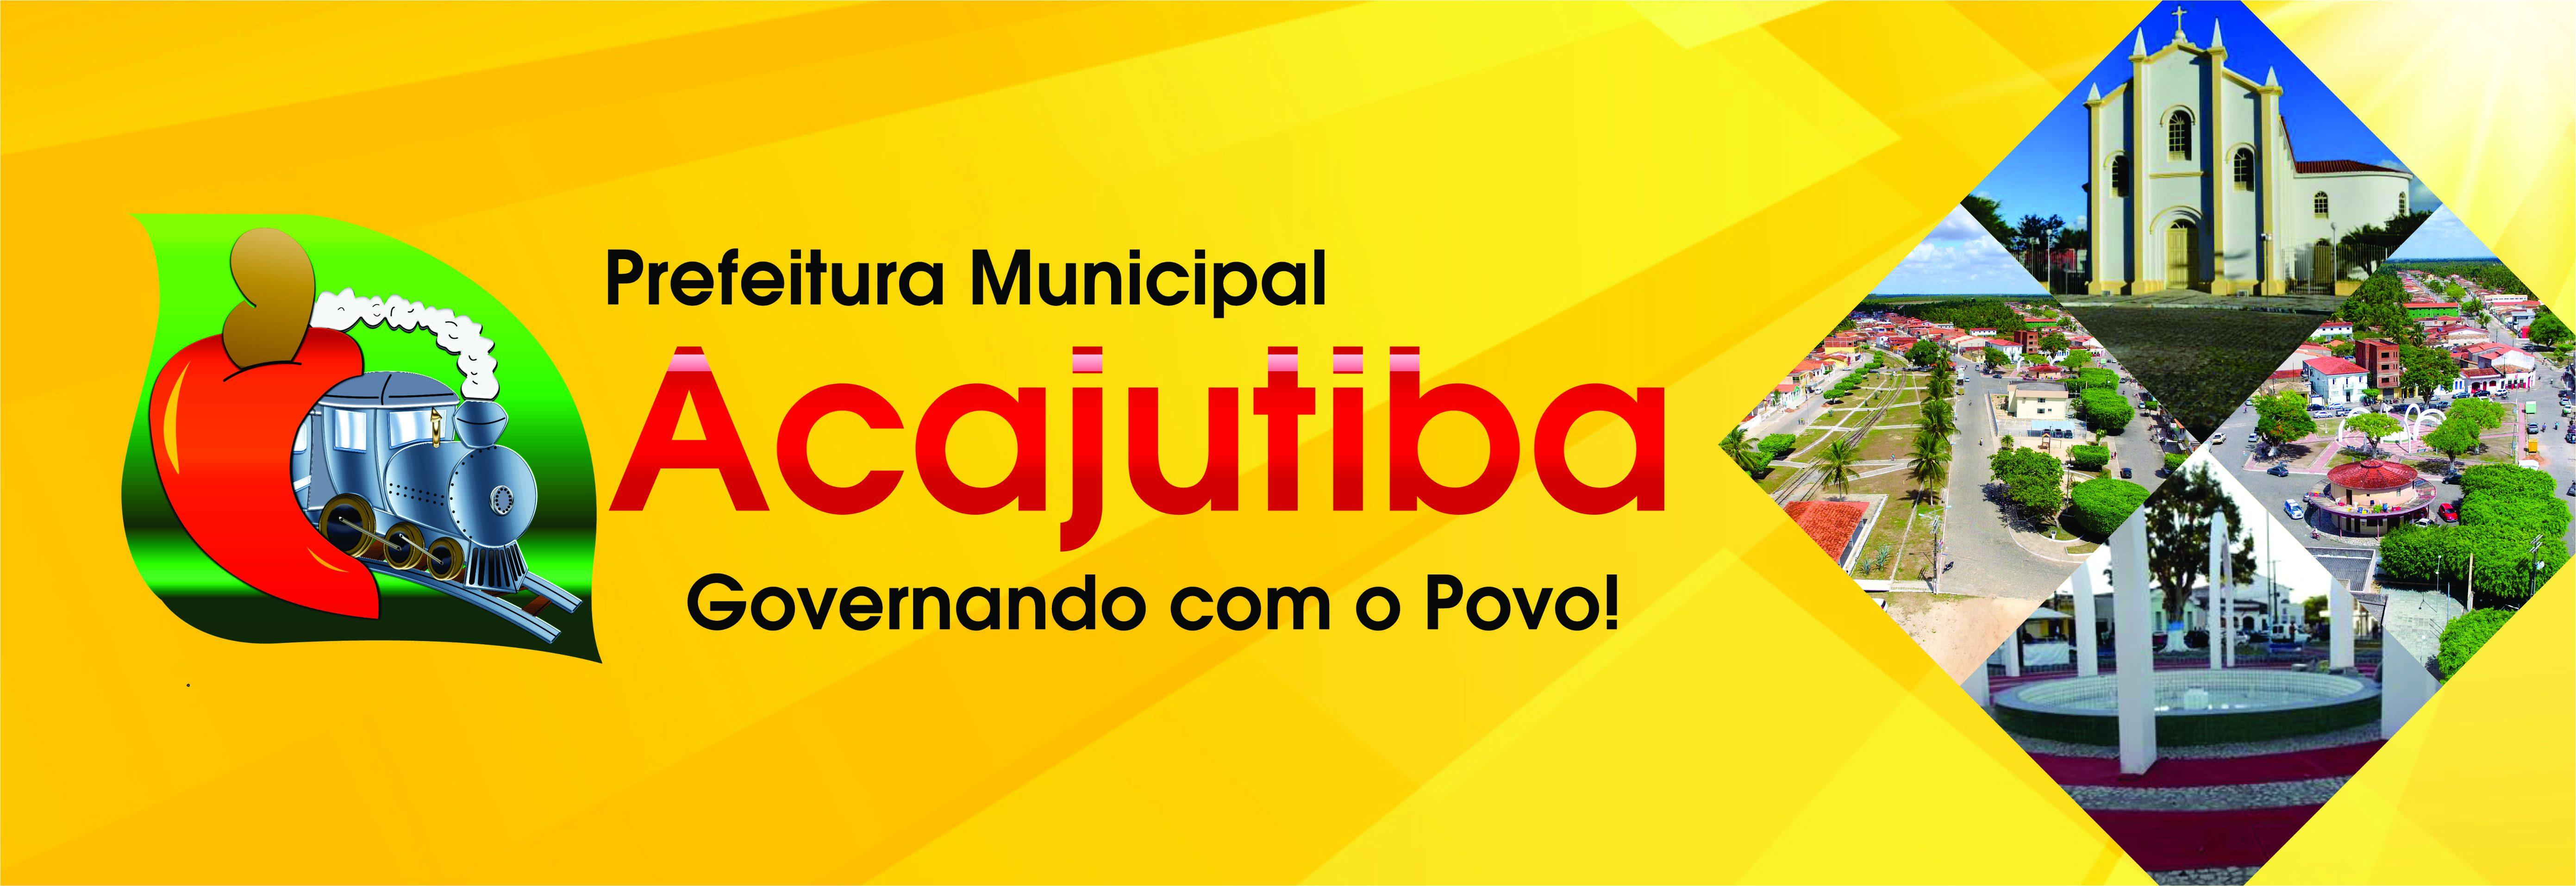 Prefeitura Municipal de Acajutiba